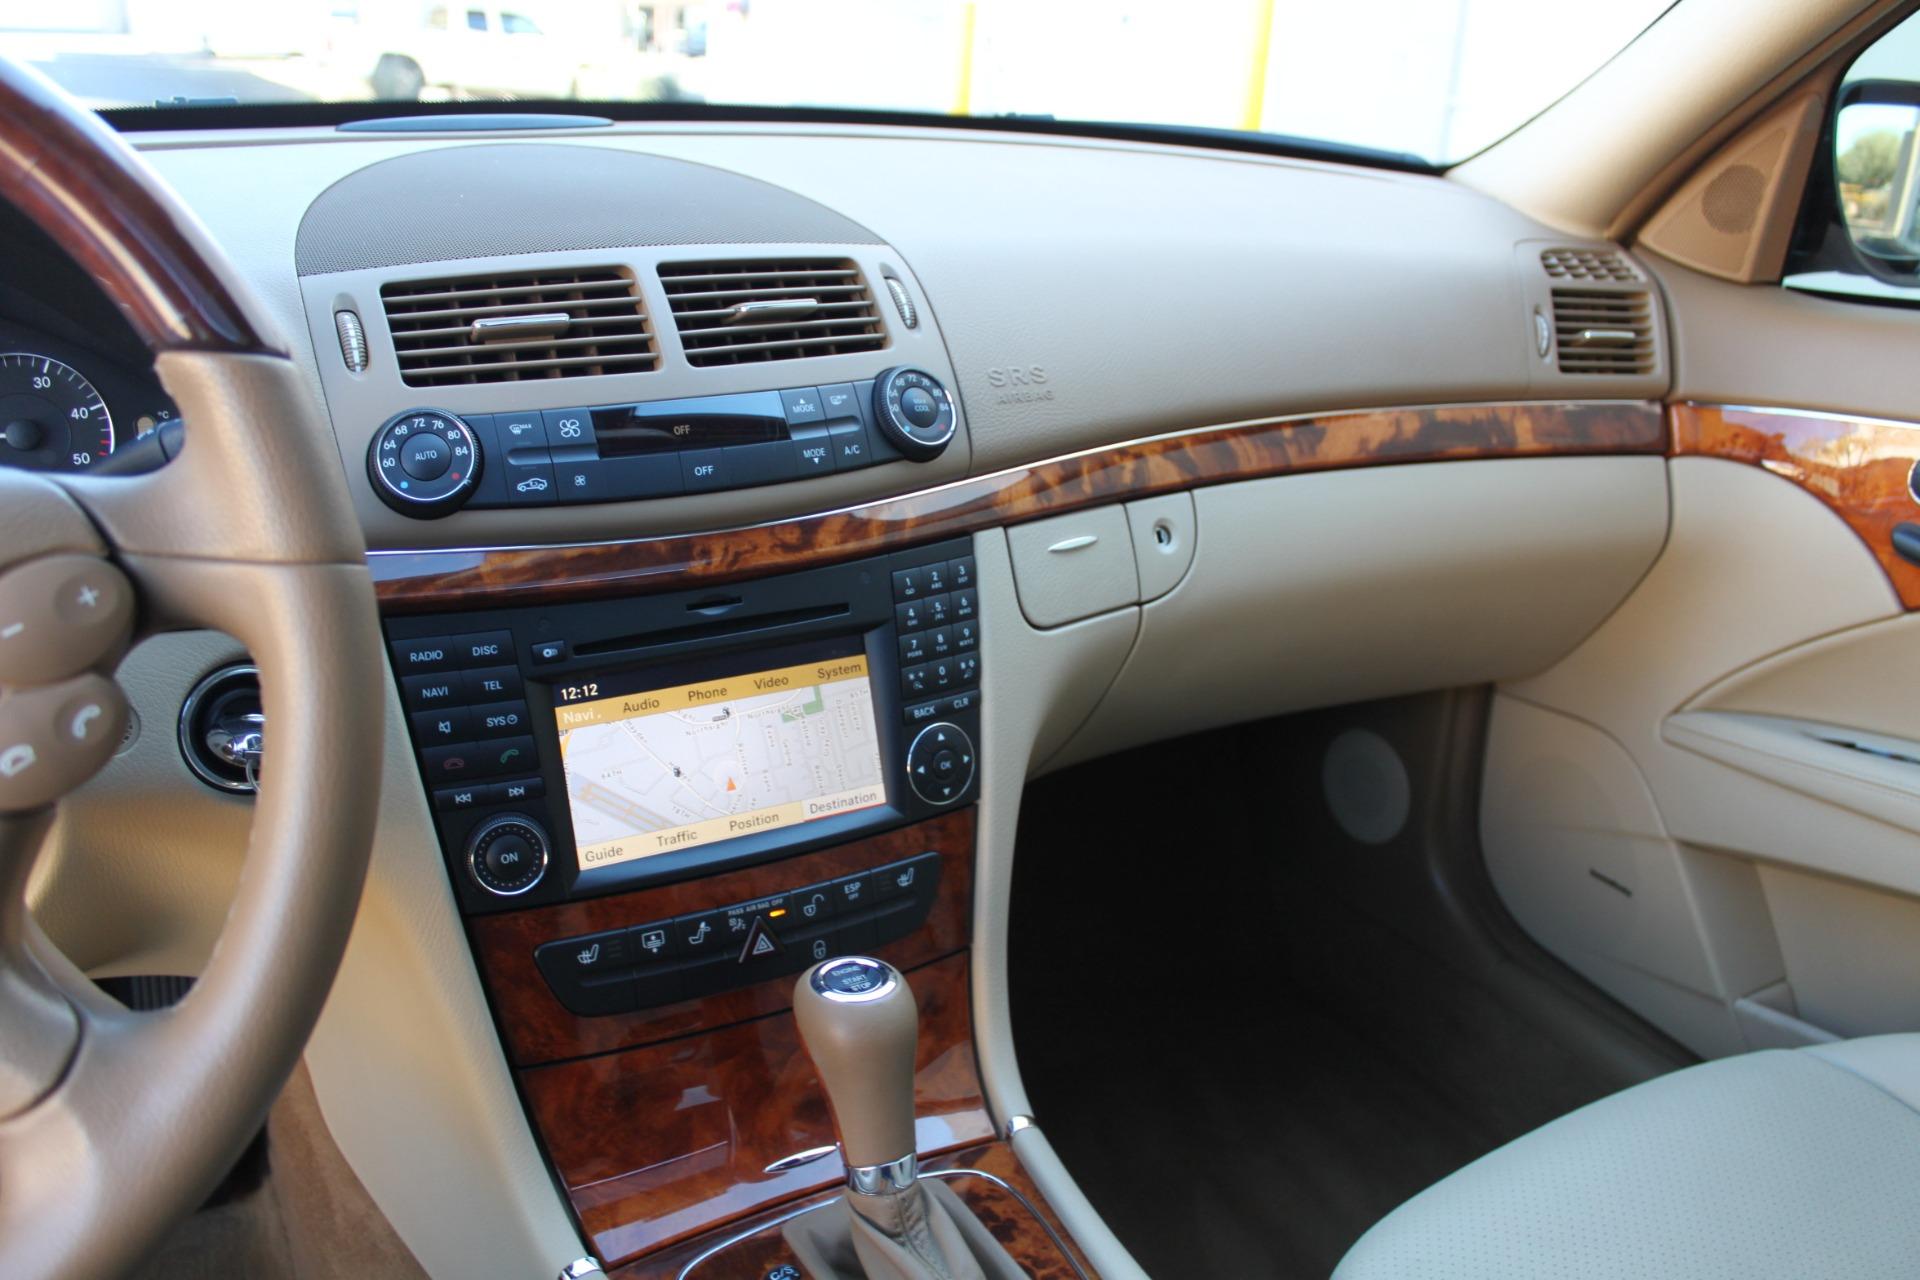 Used-2009-Mercedes-Benz-E-Class-E320-30L-BlueTEC-Wagoneer